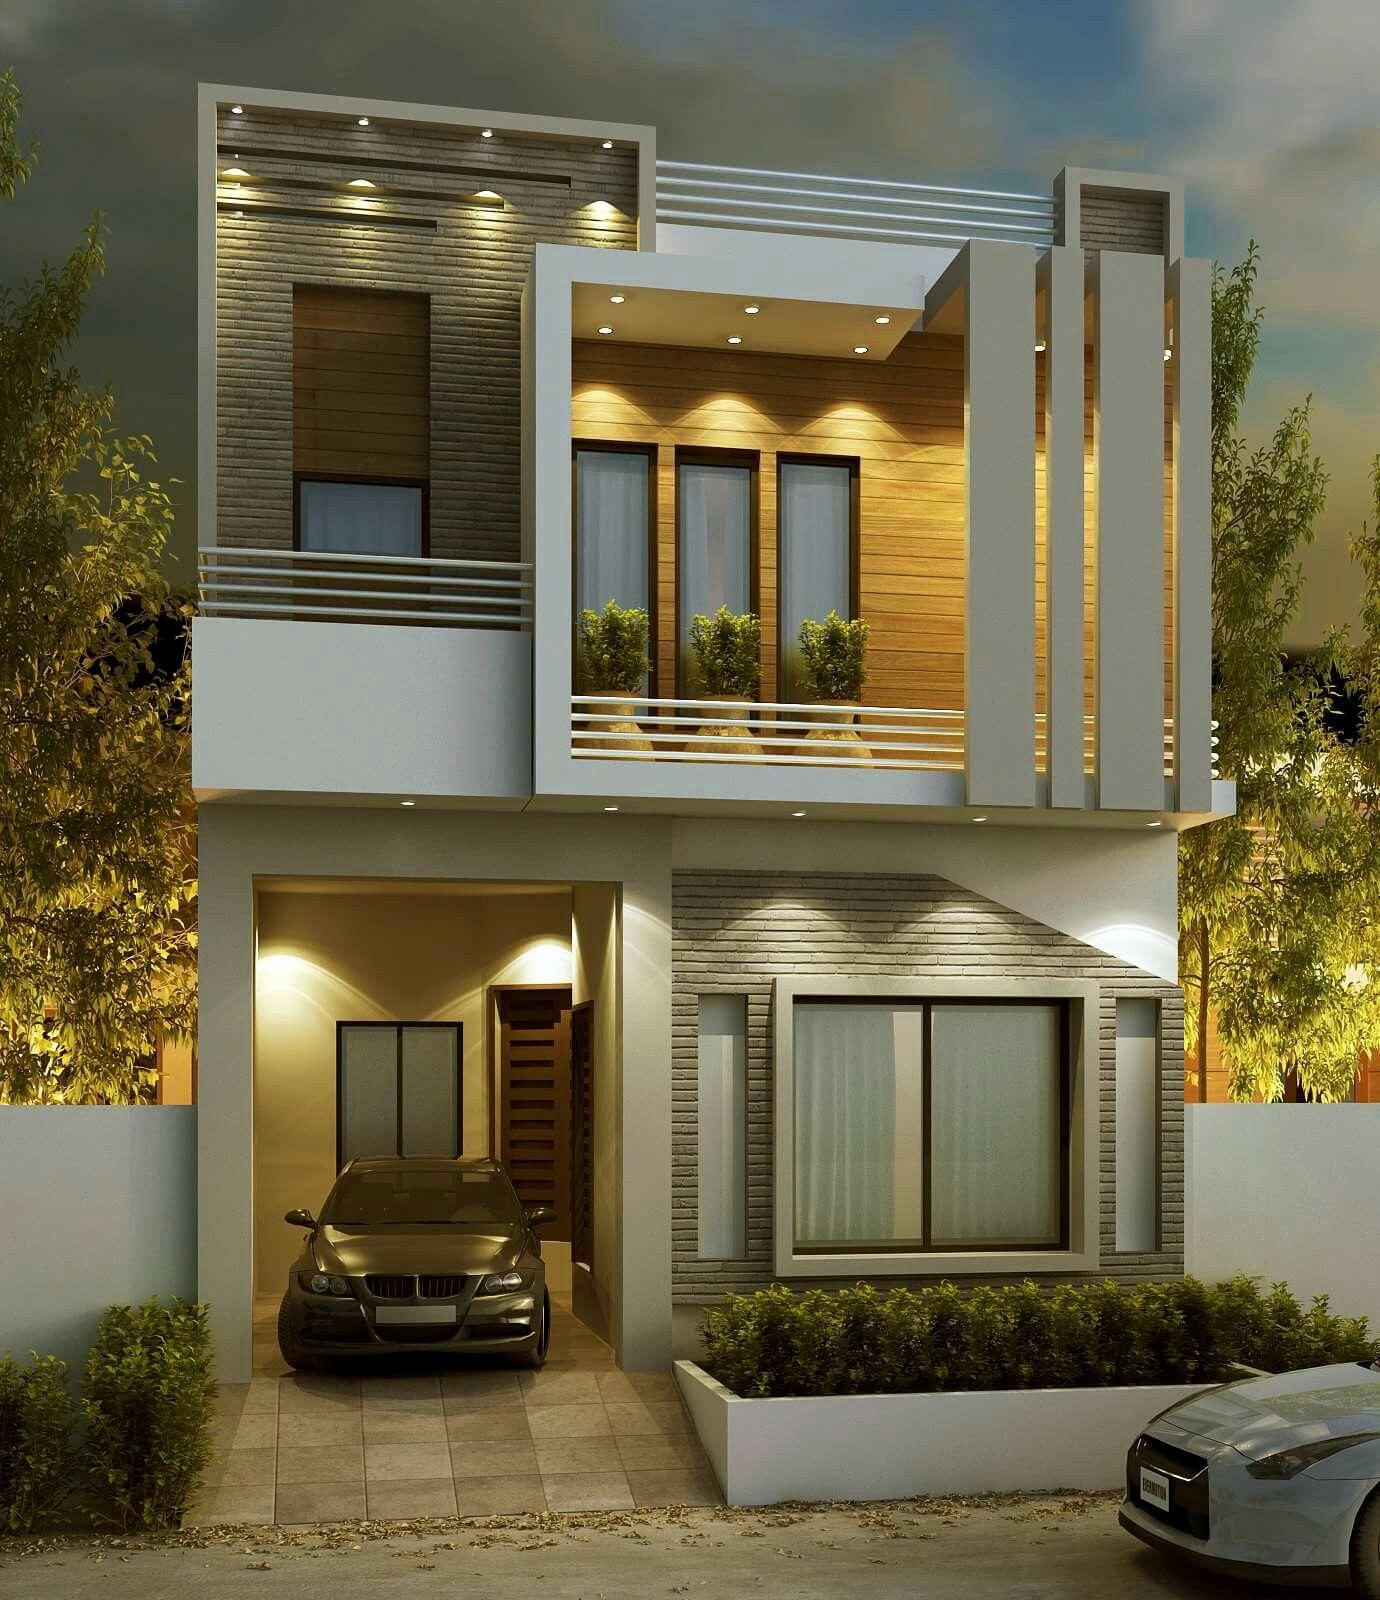 5 Marla House Plan Elevation Architecture Design